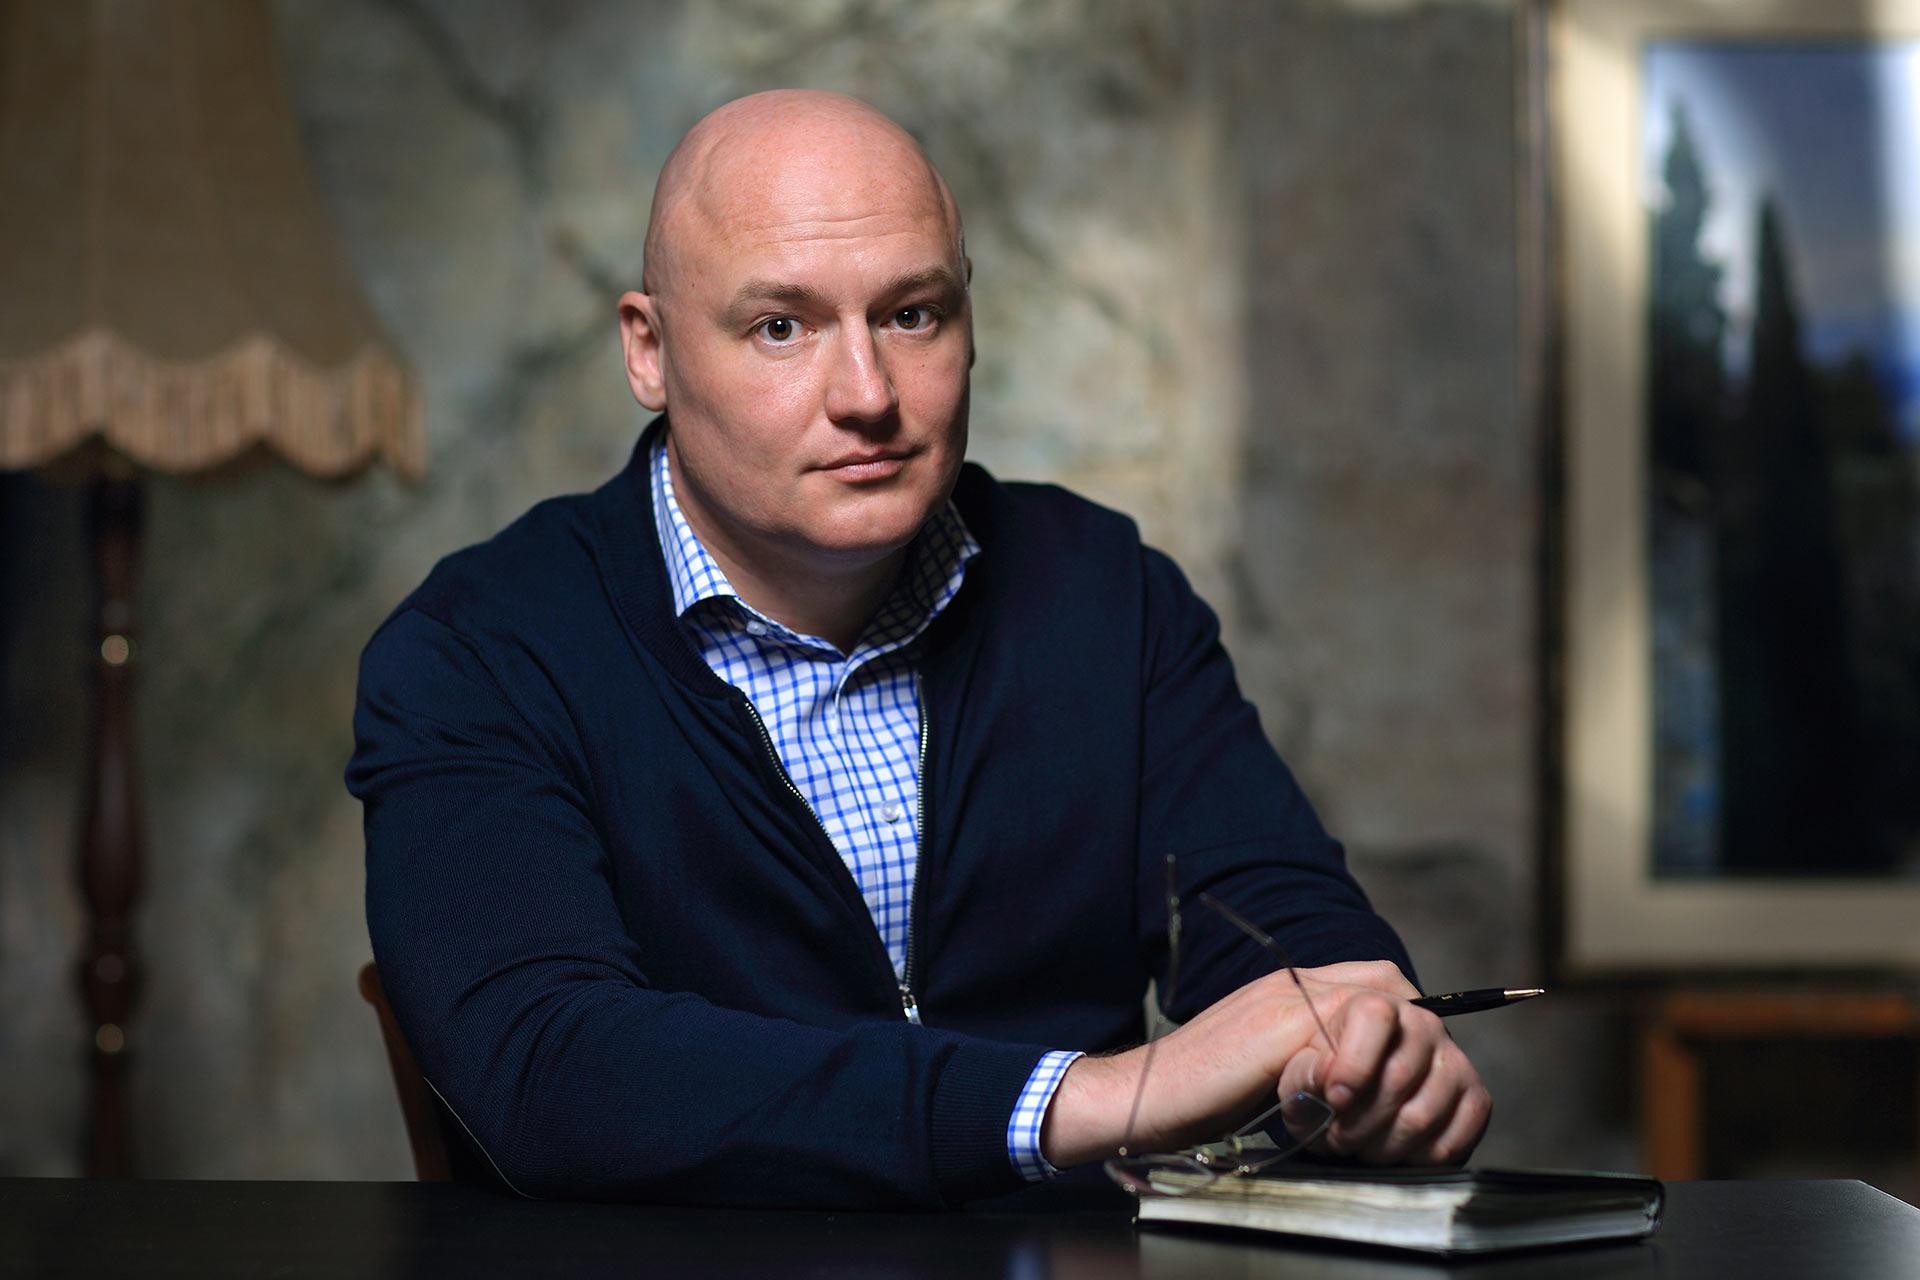 Андрей Карлов, практикующий психолог-психотерапевт